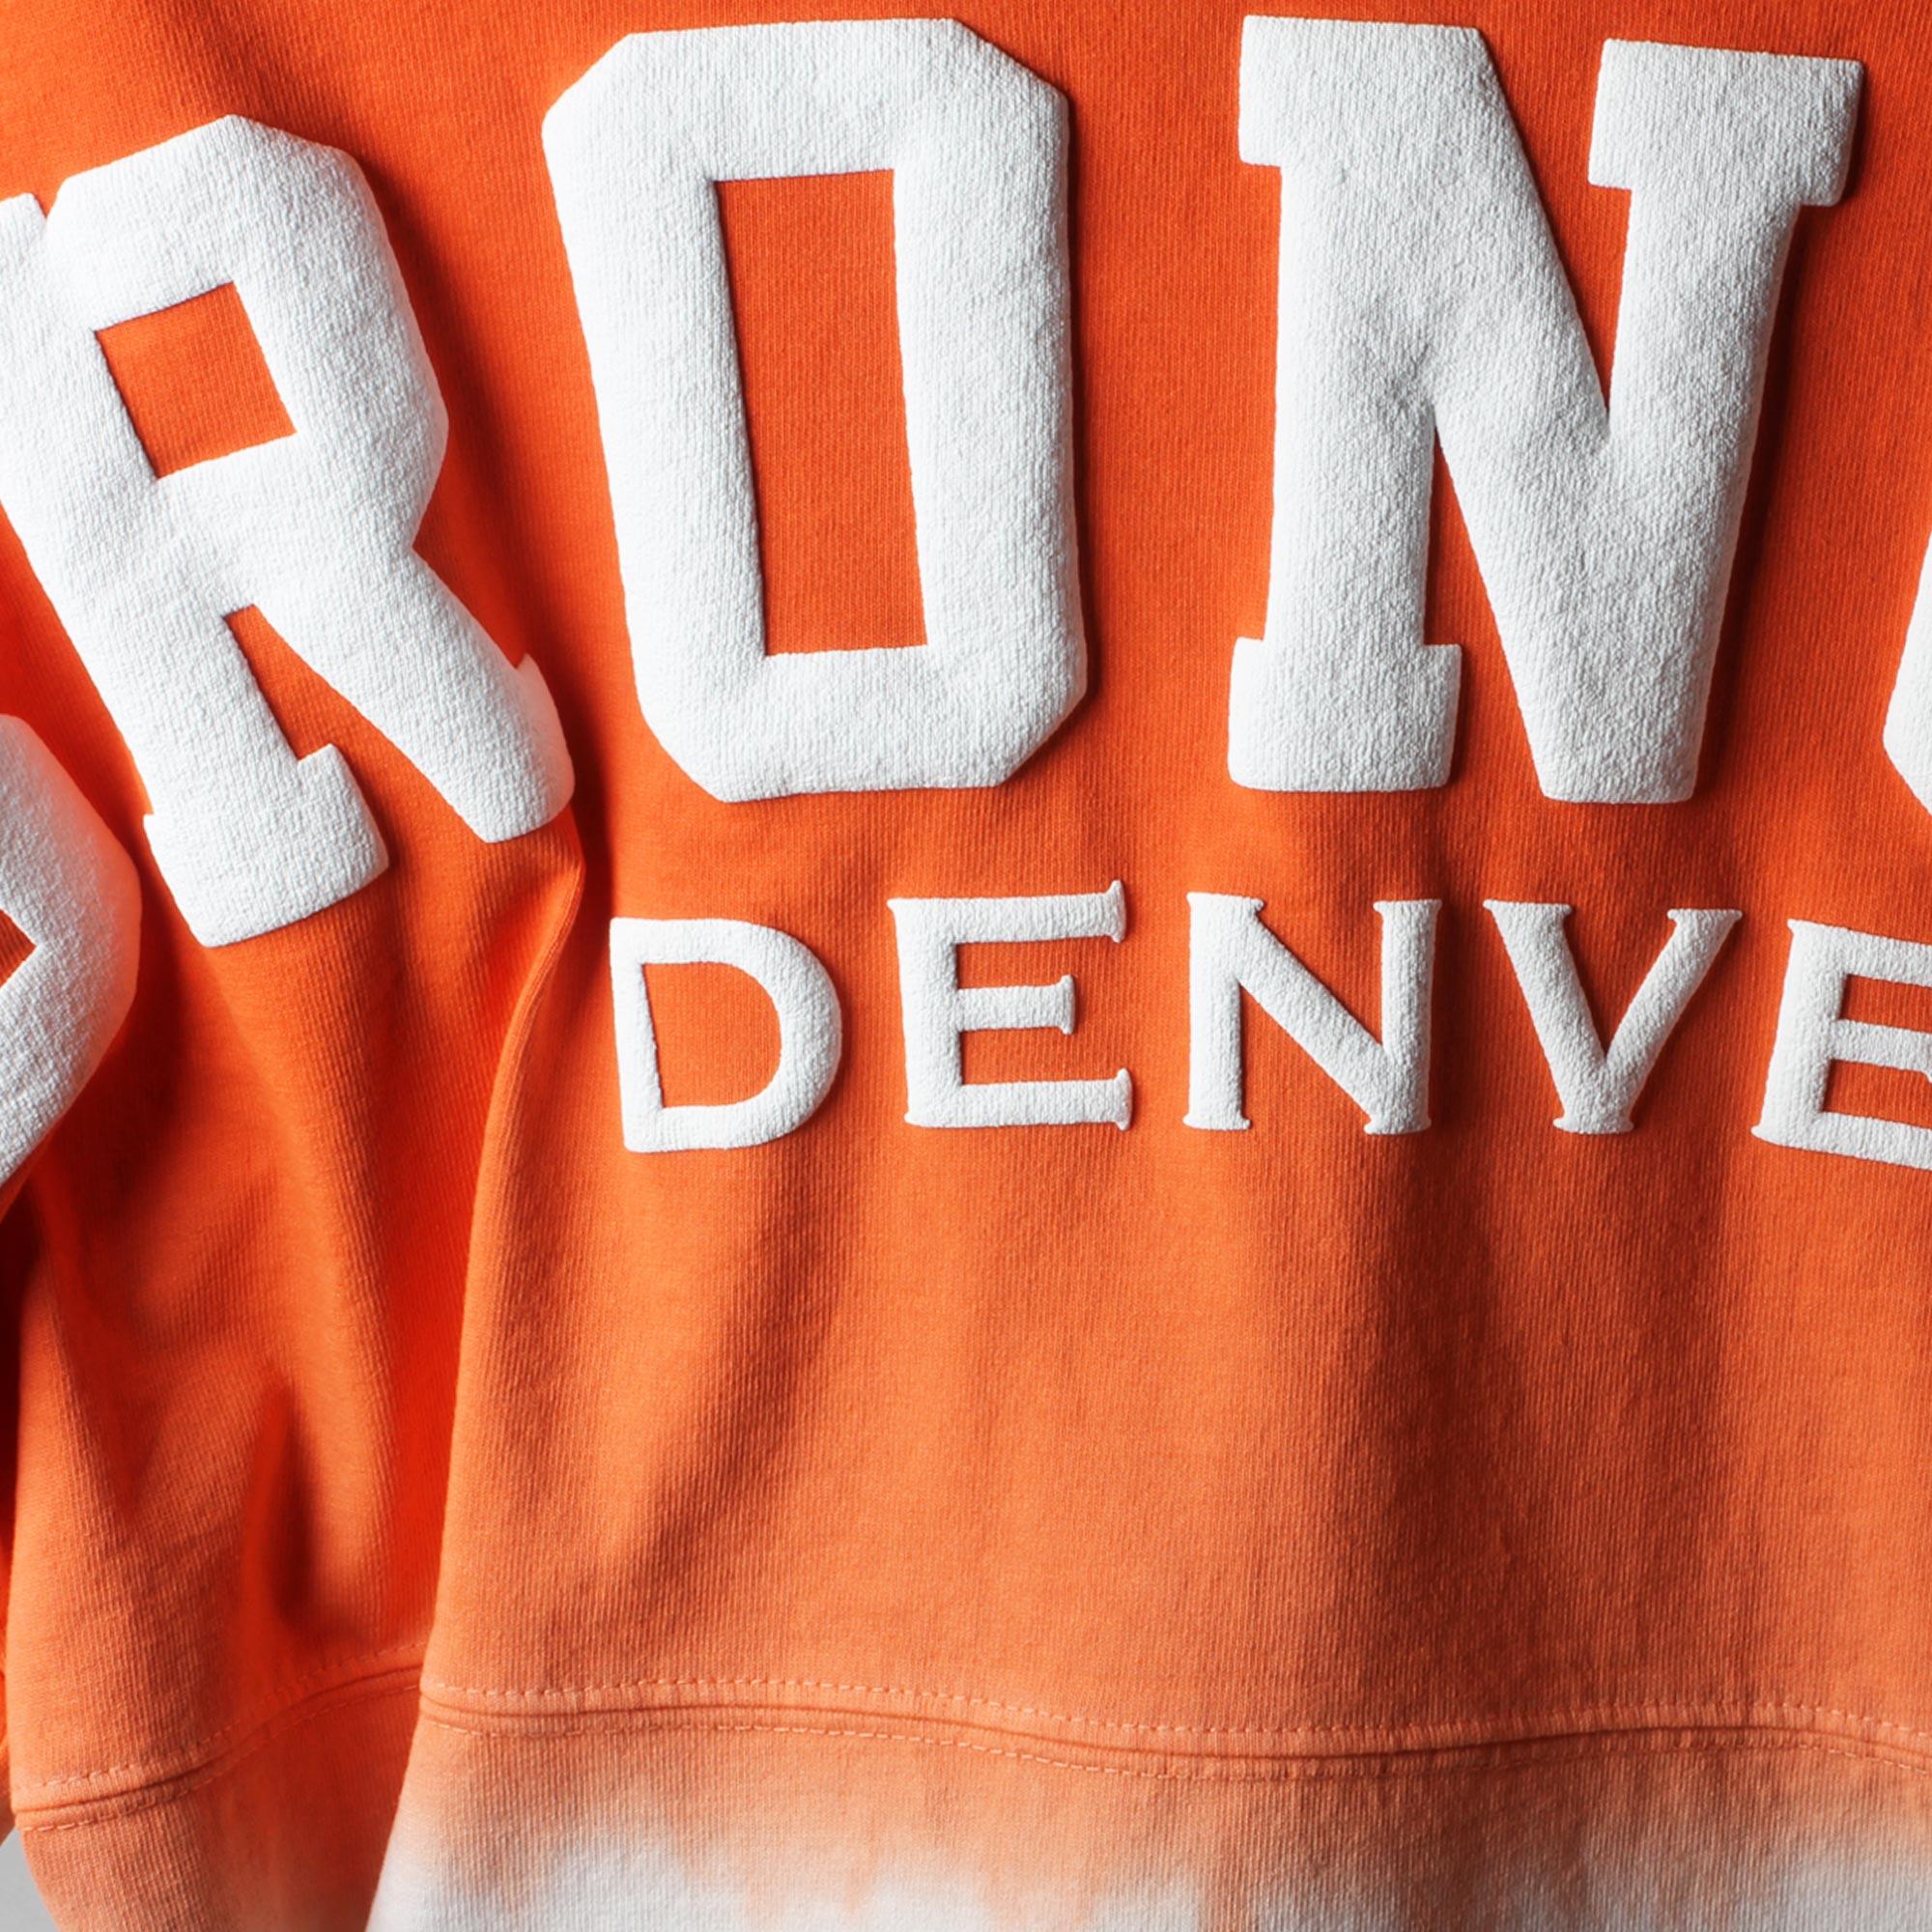 488747d8 Denver Broncos Pro Line by Fanatics Branded Women's Spirit Jersey Long  Sleeve T-Shirt - Orange/Navy - Walmart.com